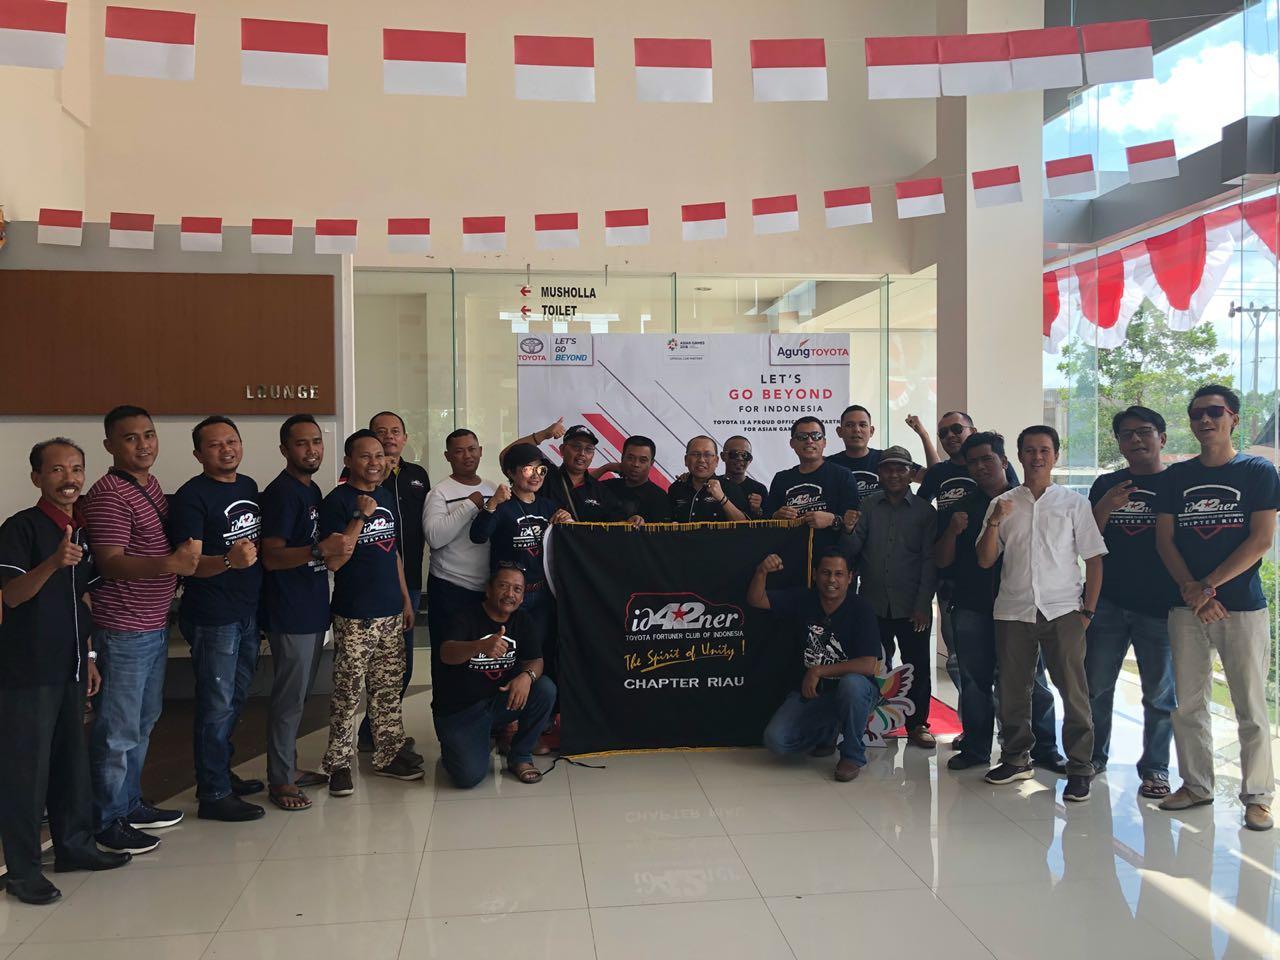 Kacab Agung Toyota Taluk Kuantan foto bersama komunutas ID42NER Ch Riau